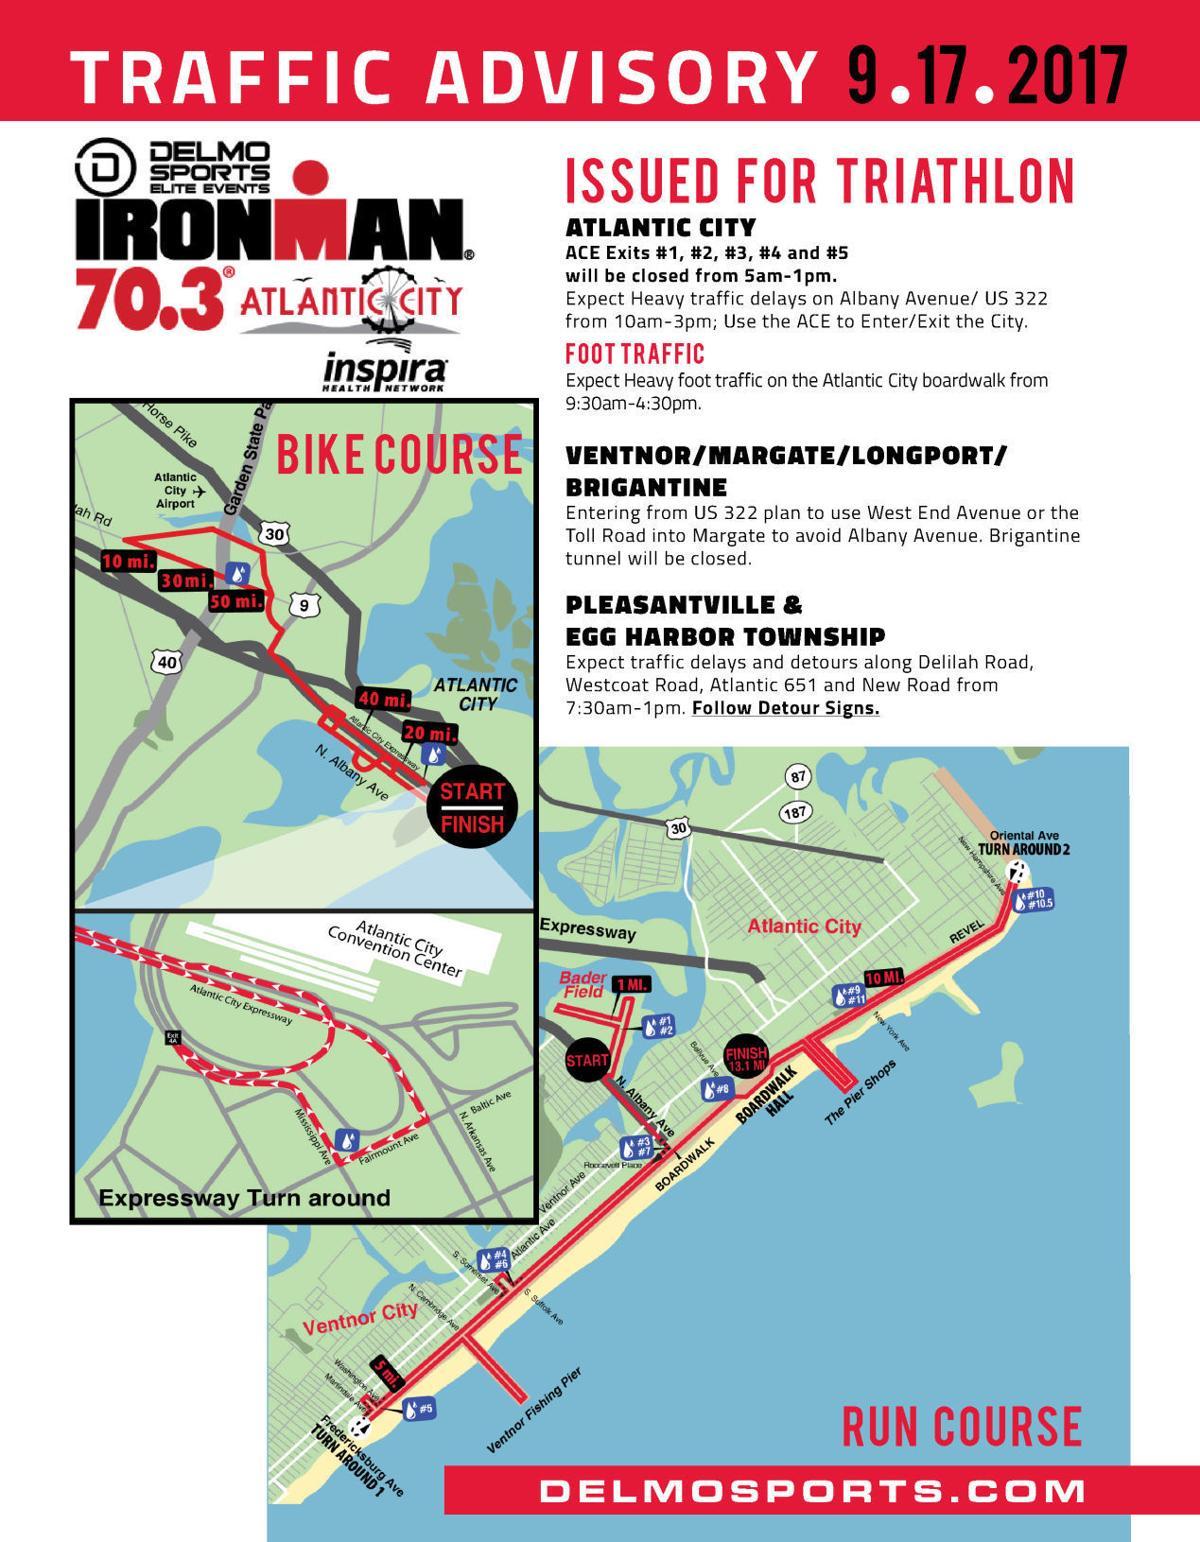 Ironman Triathlon Traffic Advisory